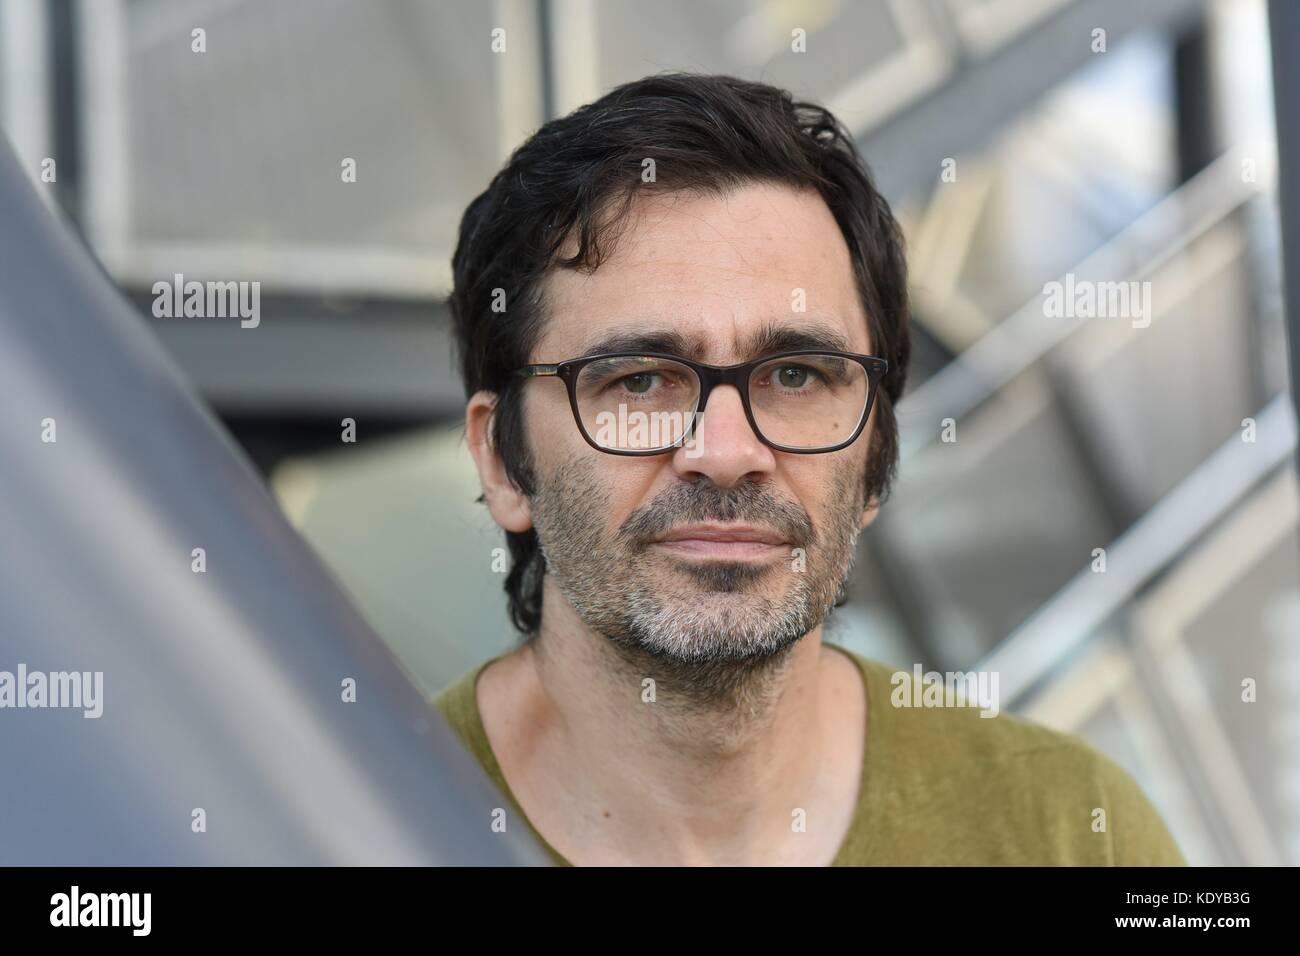 Nicol Ljubic at the 69th Frankfurt Book Fair in Frankfurt/Main, Germany, October 2017. | usage worldwide - Stock Image